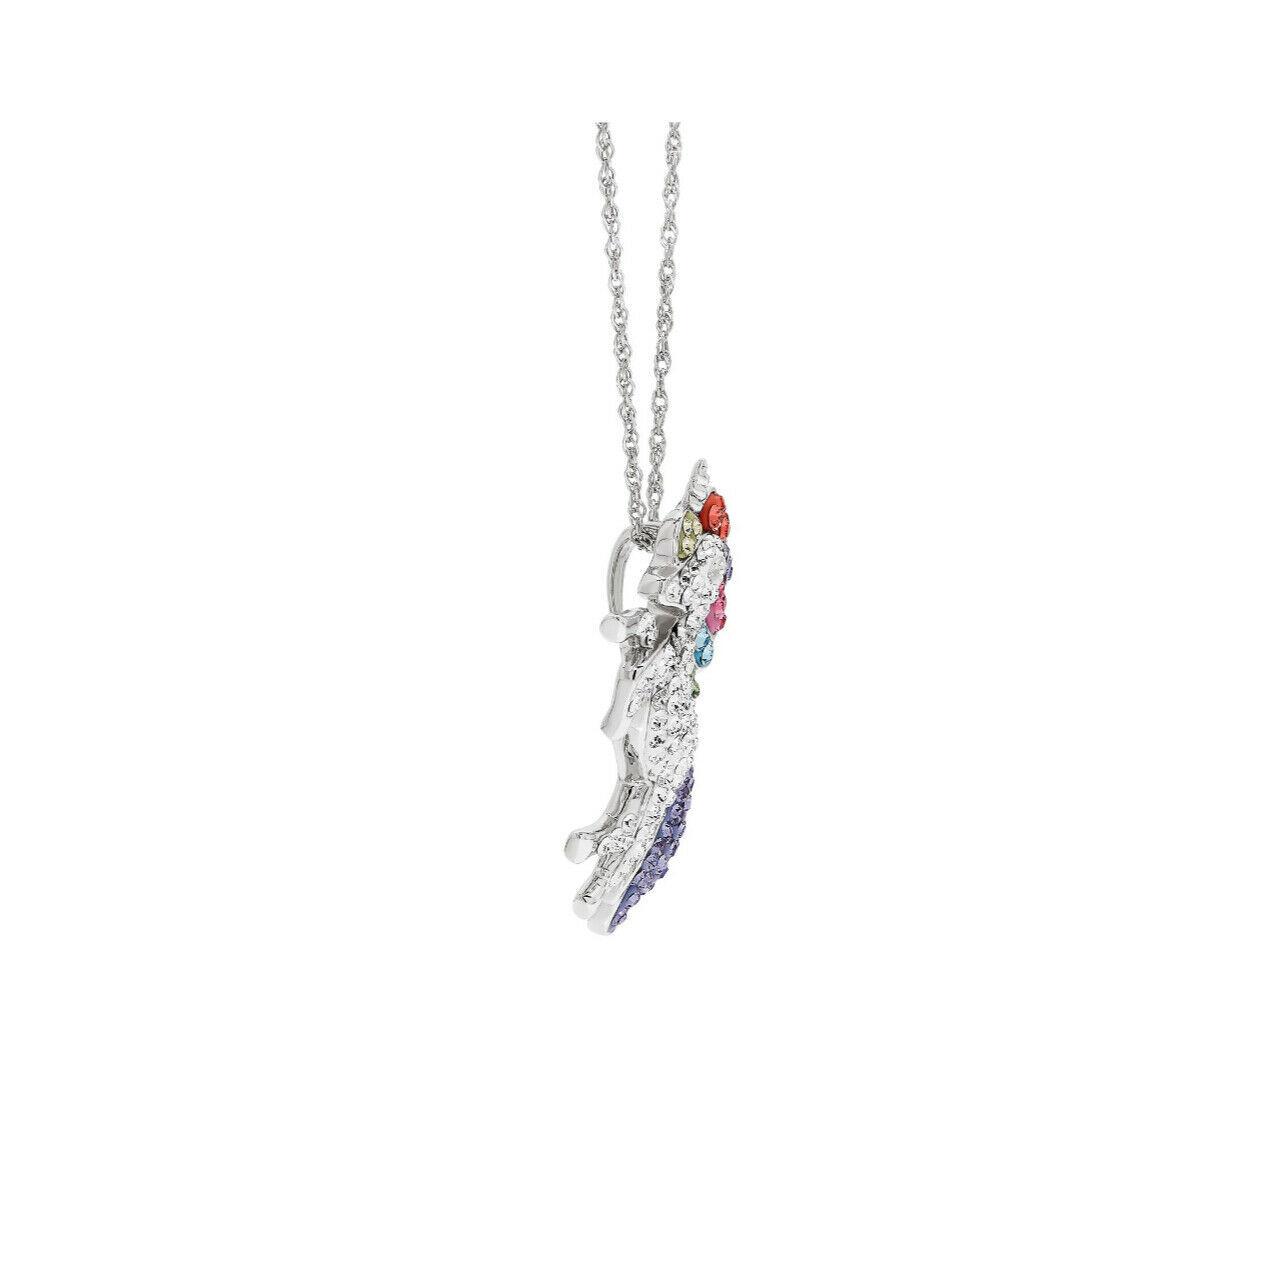 "Swarovski Sterling Silver Unicorn Pendant, 18"" Necklace Jewlery Crystals"